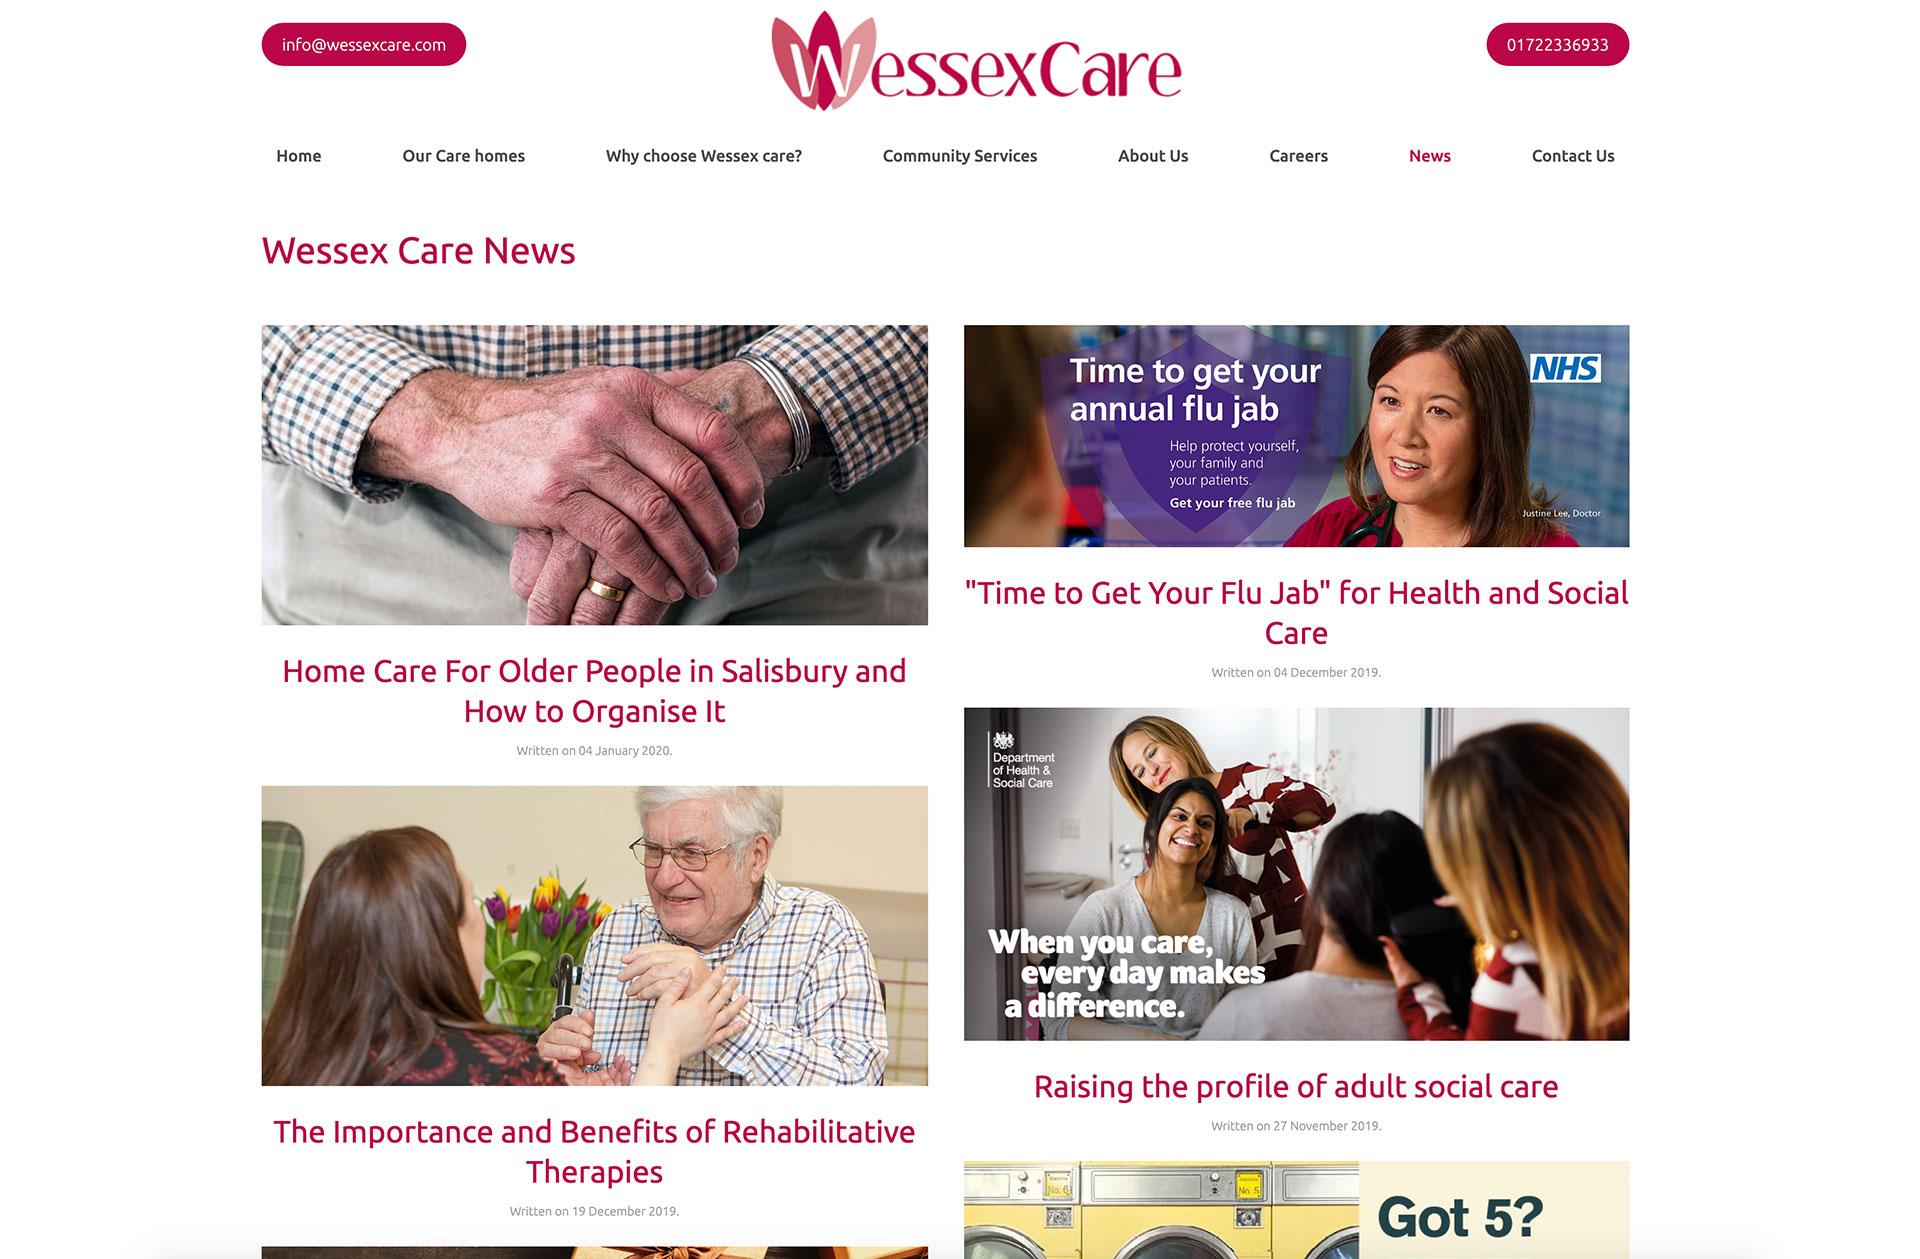 Wessex Care website